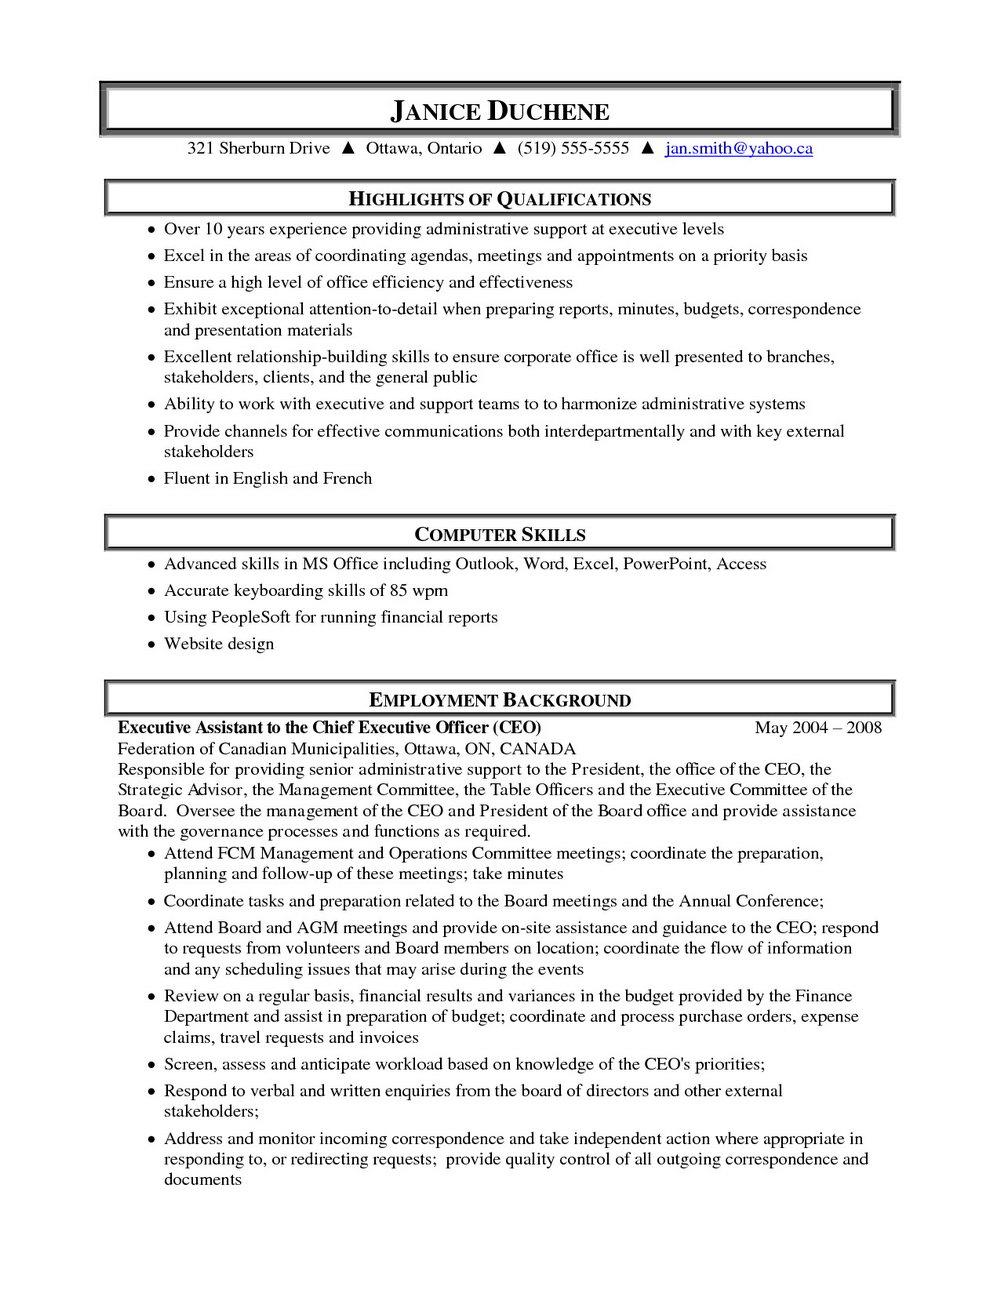 Sample Resume Templates Free Download